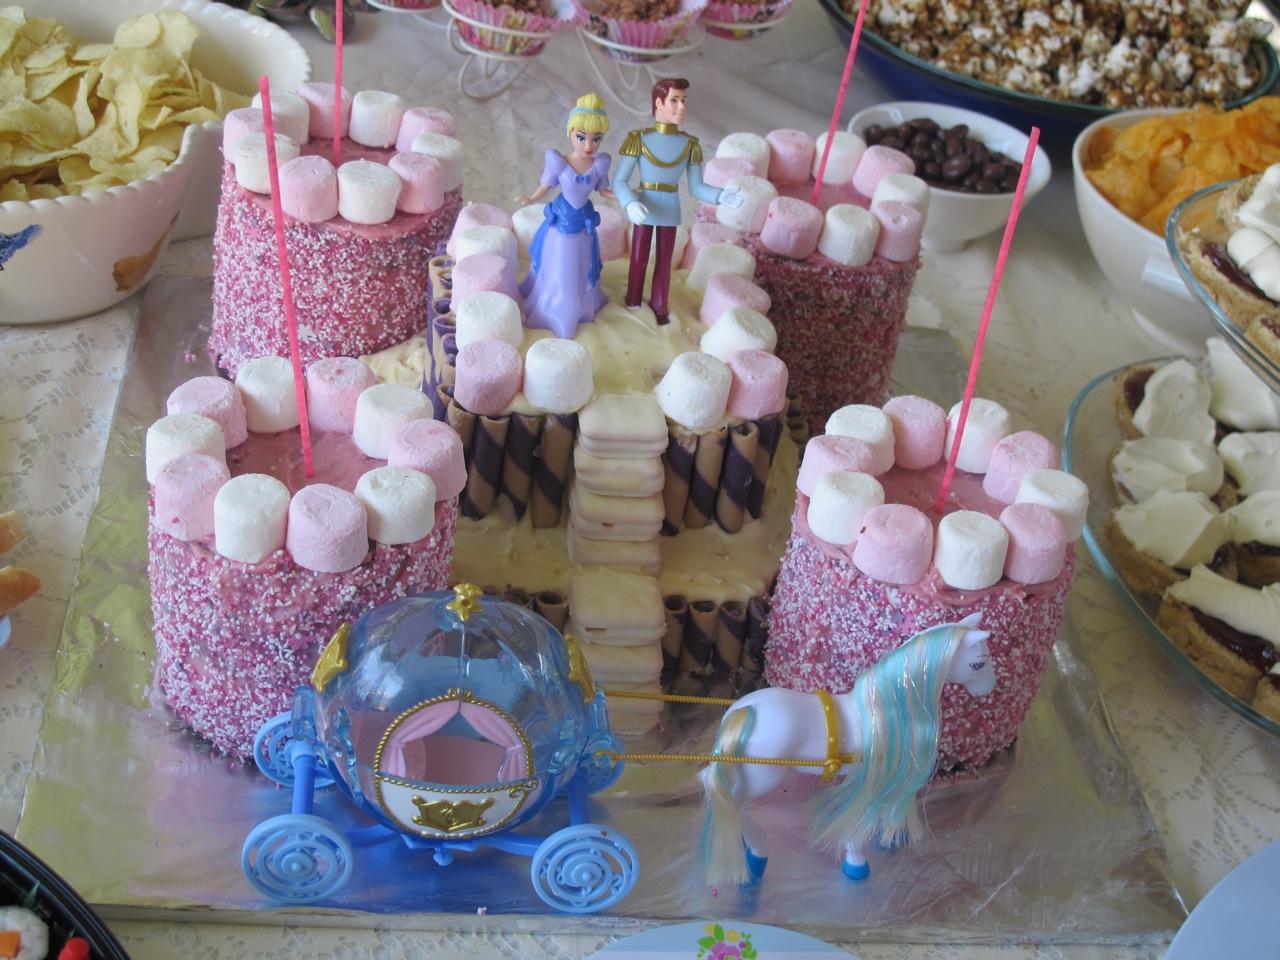 Birthday Party Ideas Winnipeg Image Inspiration of Cake and